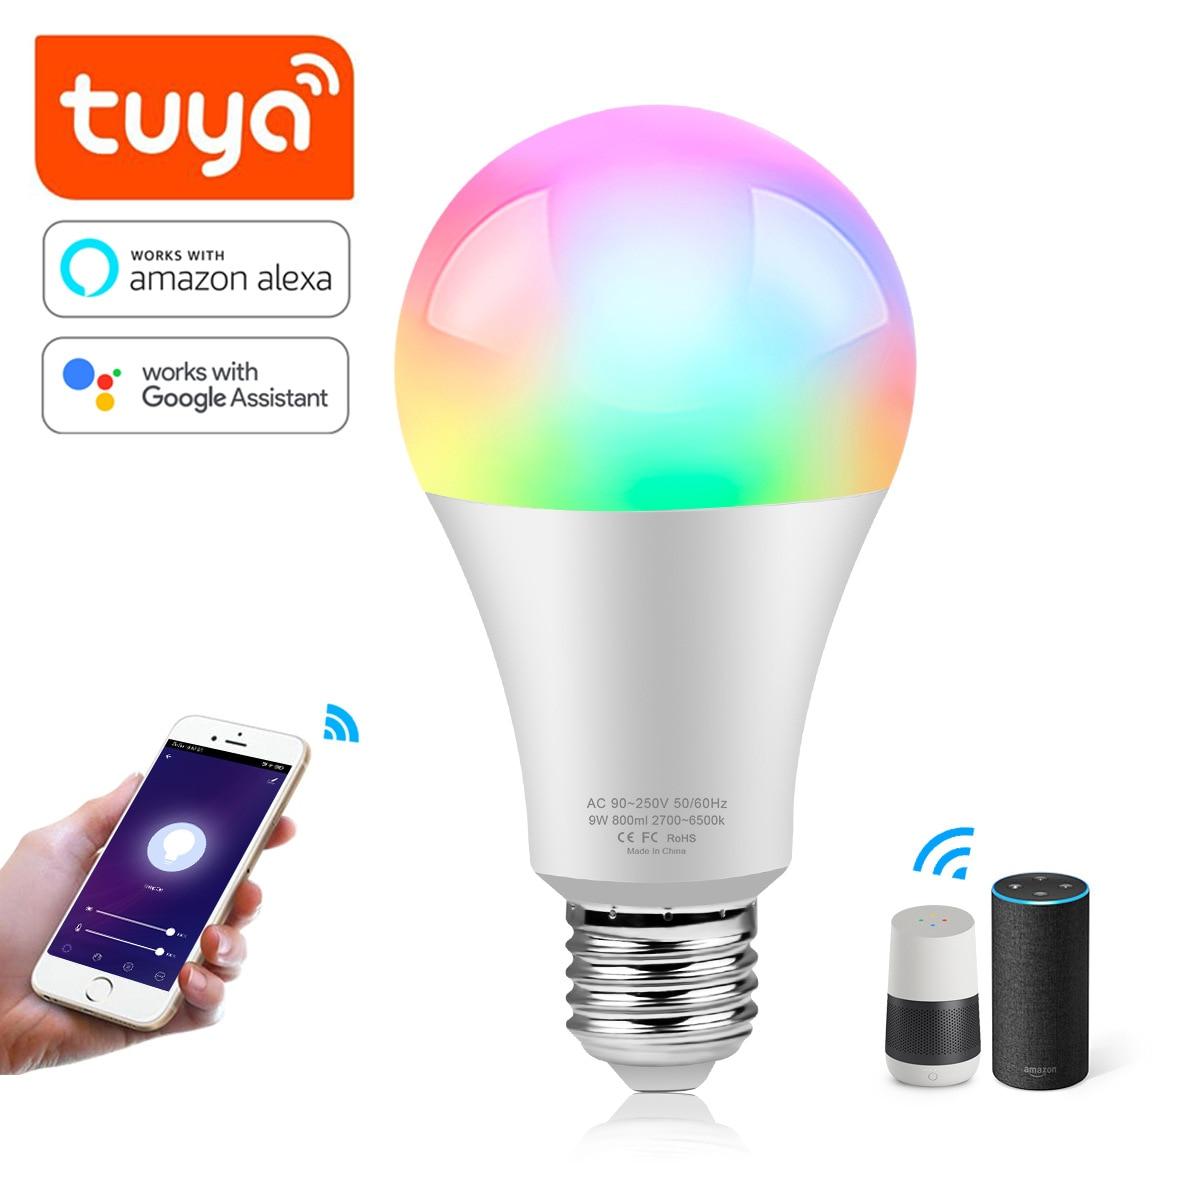 WiFi E27 LED Smart Light Bulb Color Changing Lamp Voice Control Alexa Google Home Assistant APP Tuya Remote Control Magical Bulb